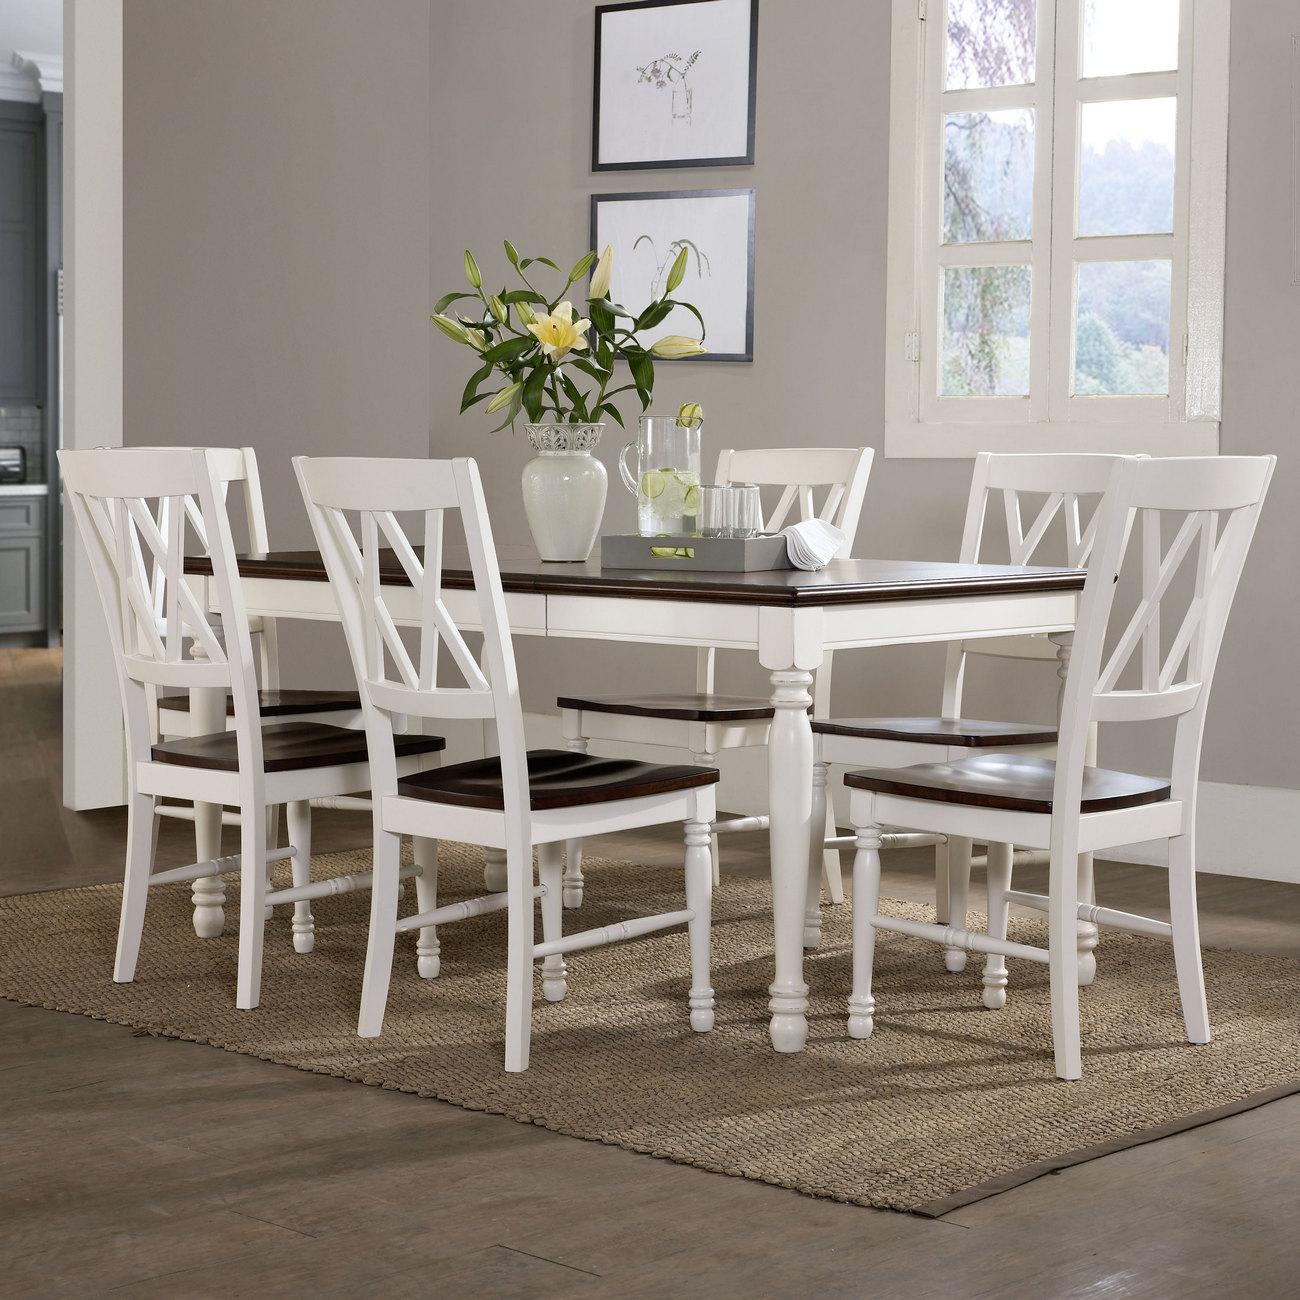 Crosley Brands Furniture Dining Set Photo